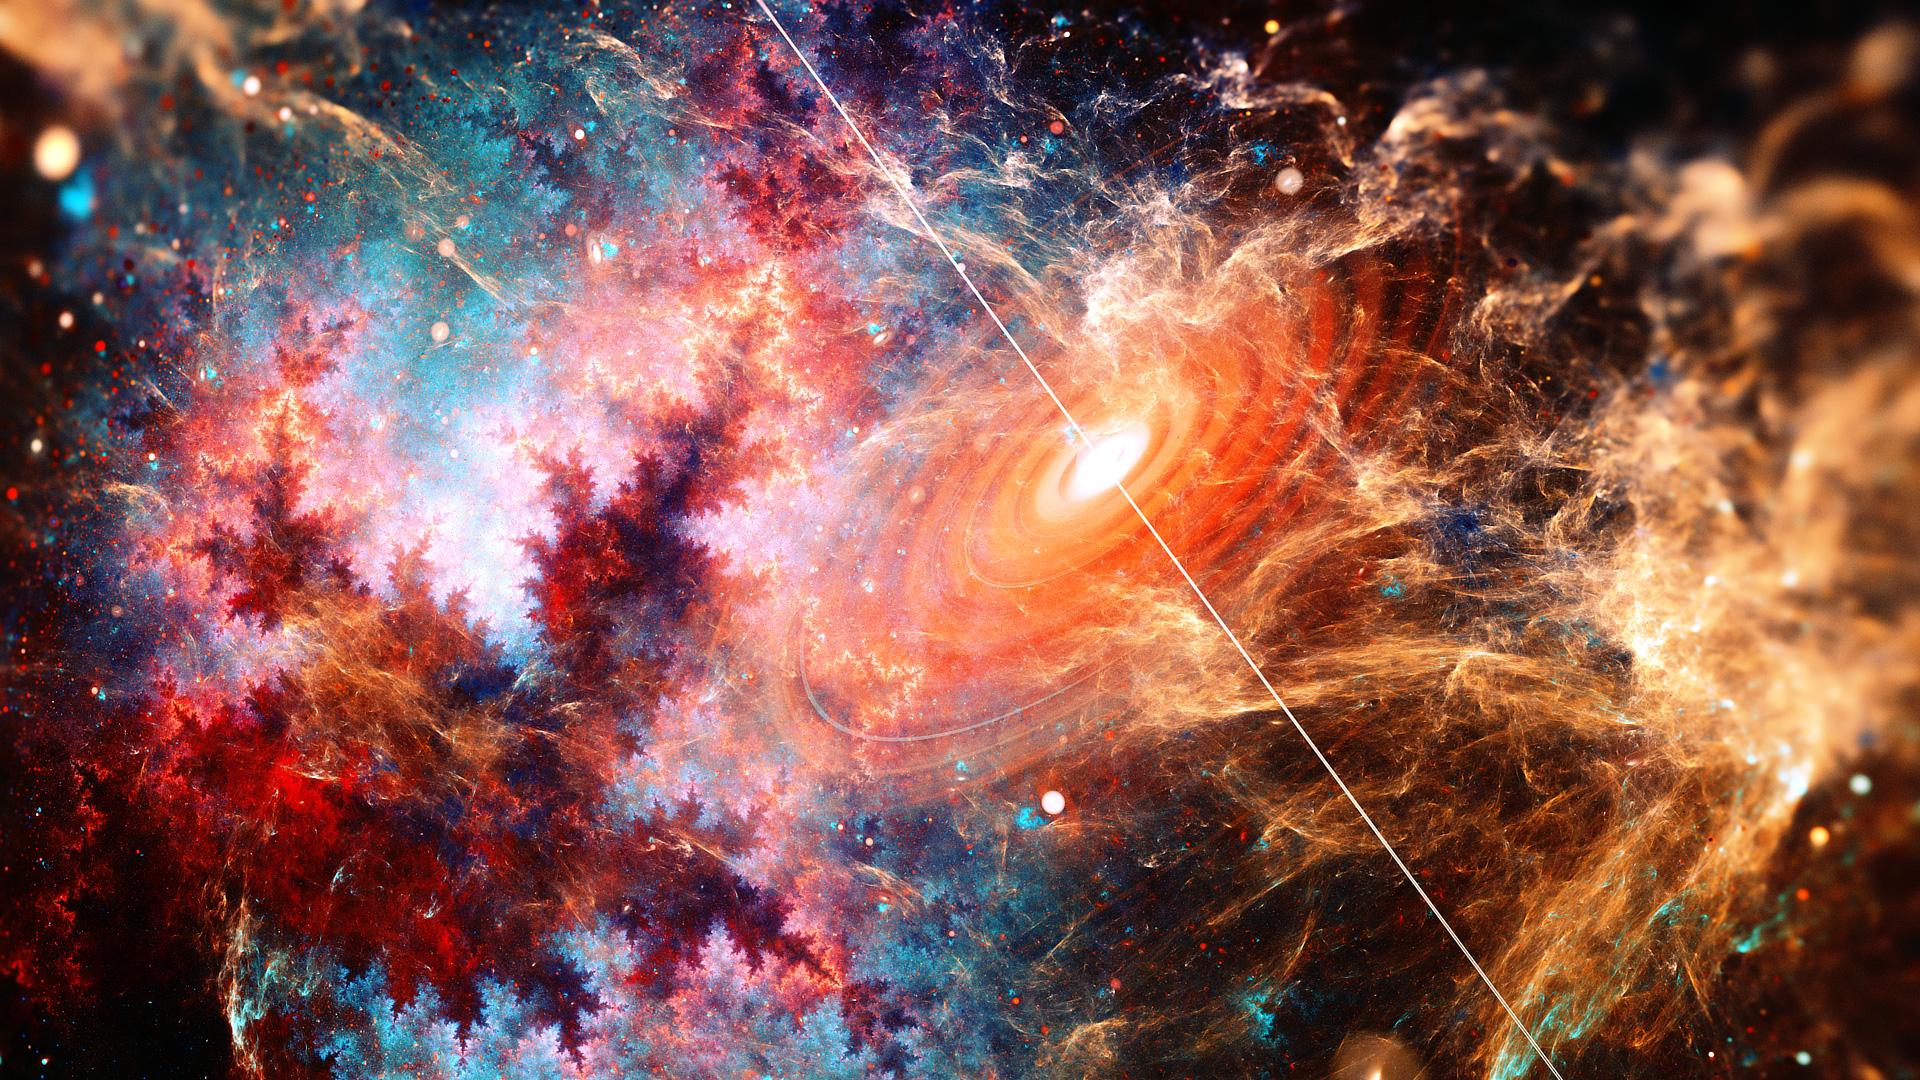 Beautiful Galaxy Fractal Art Hd Digital Universe 4k